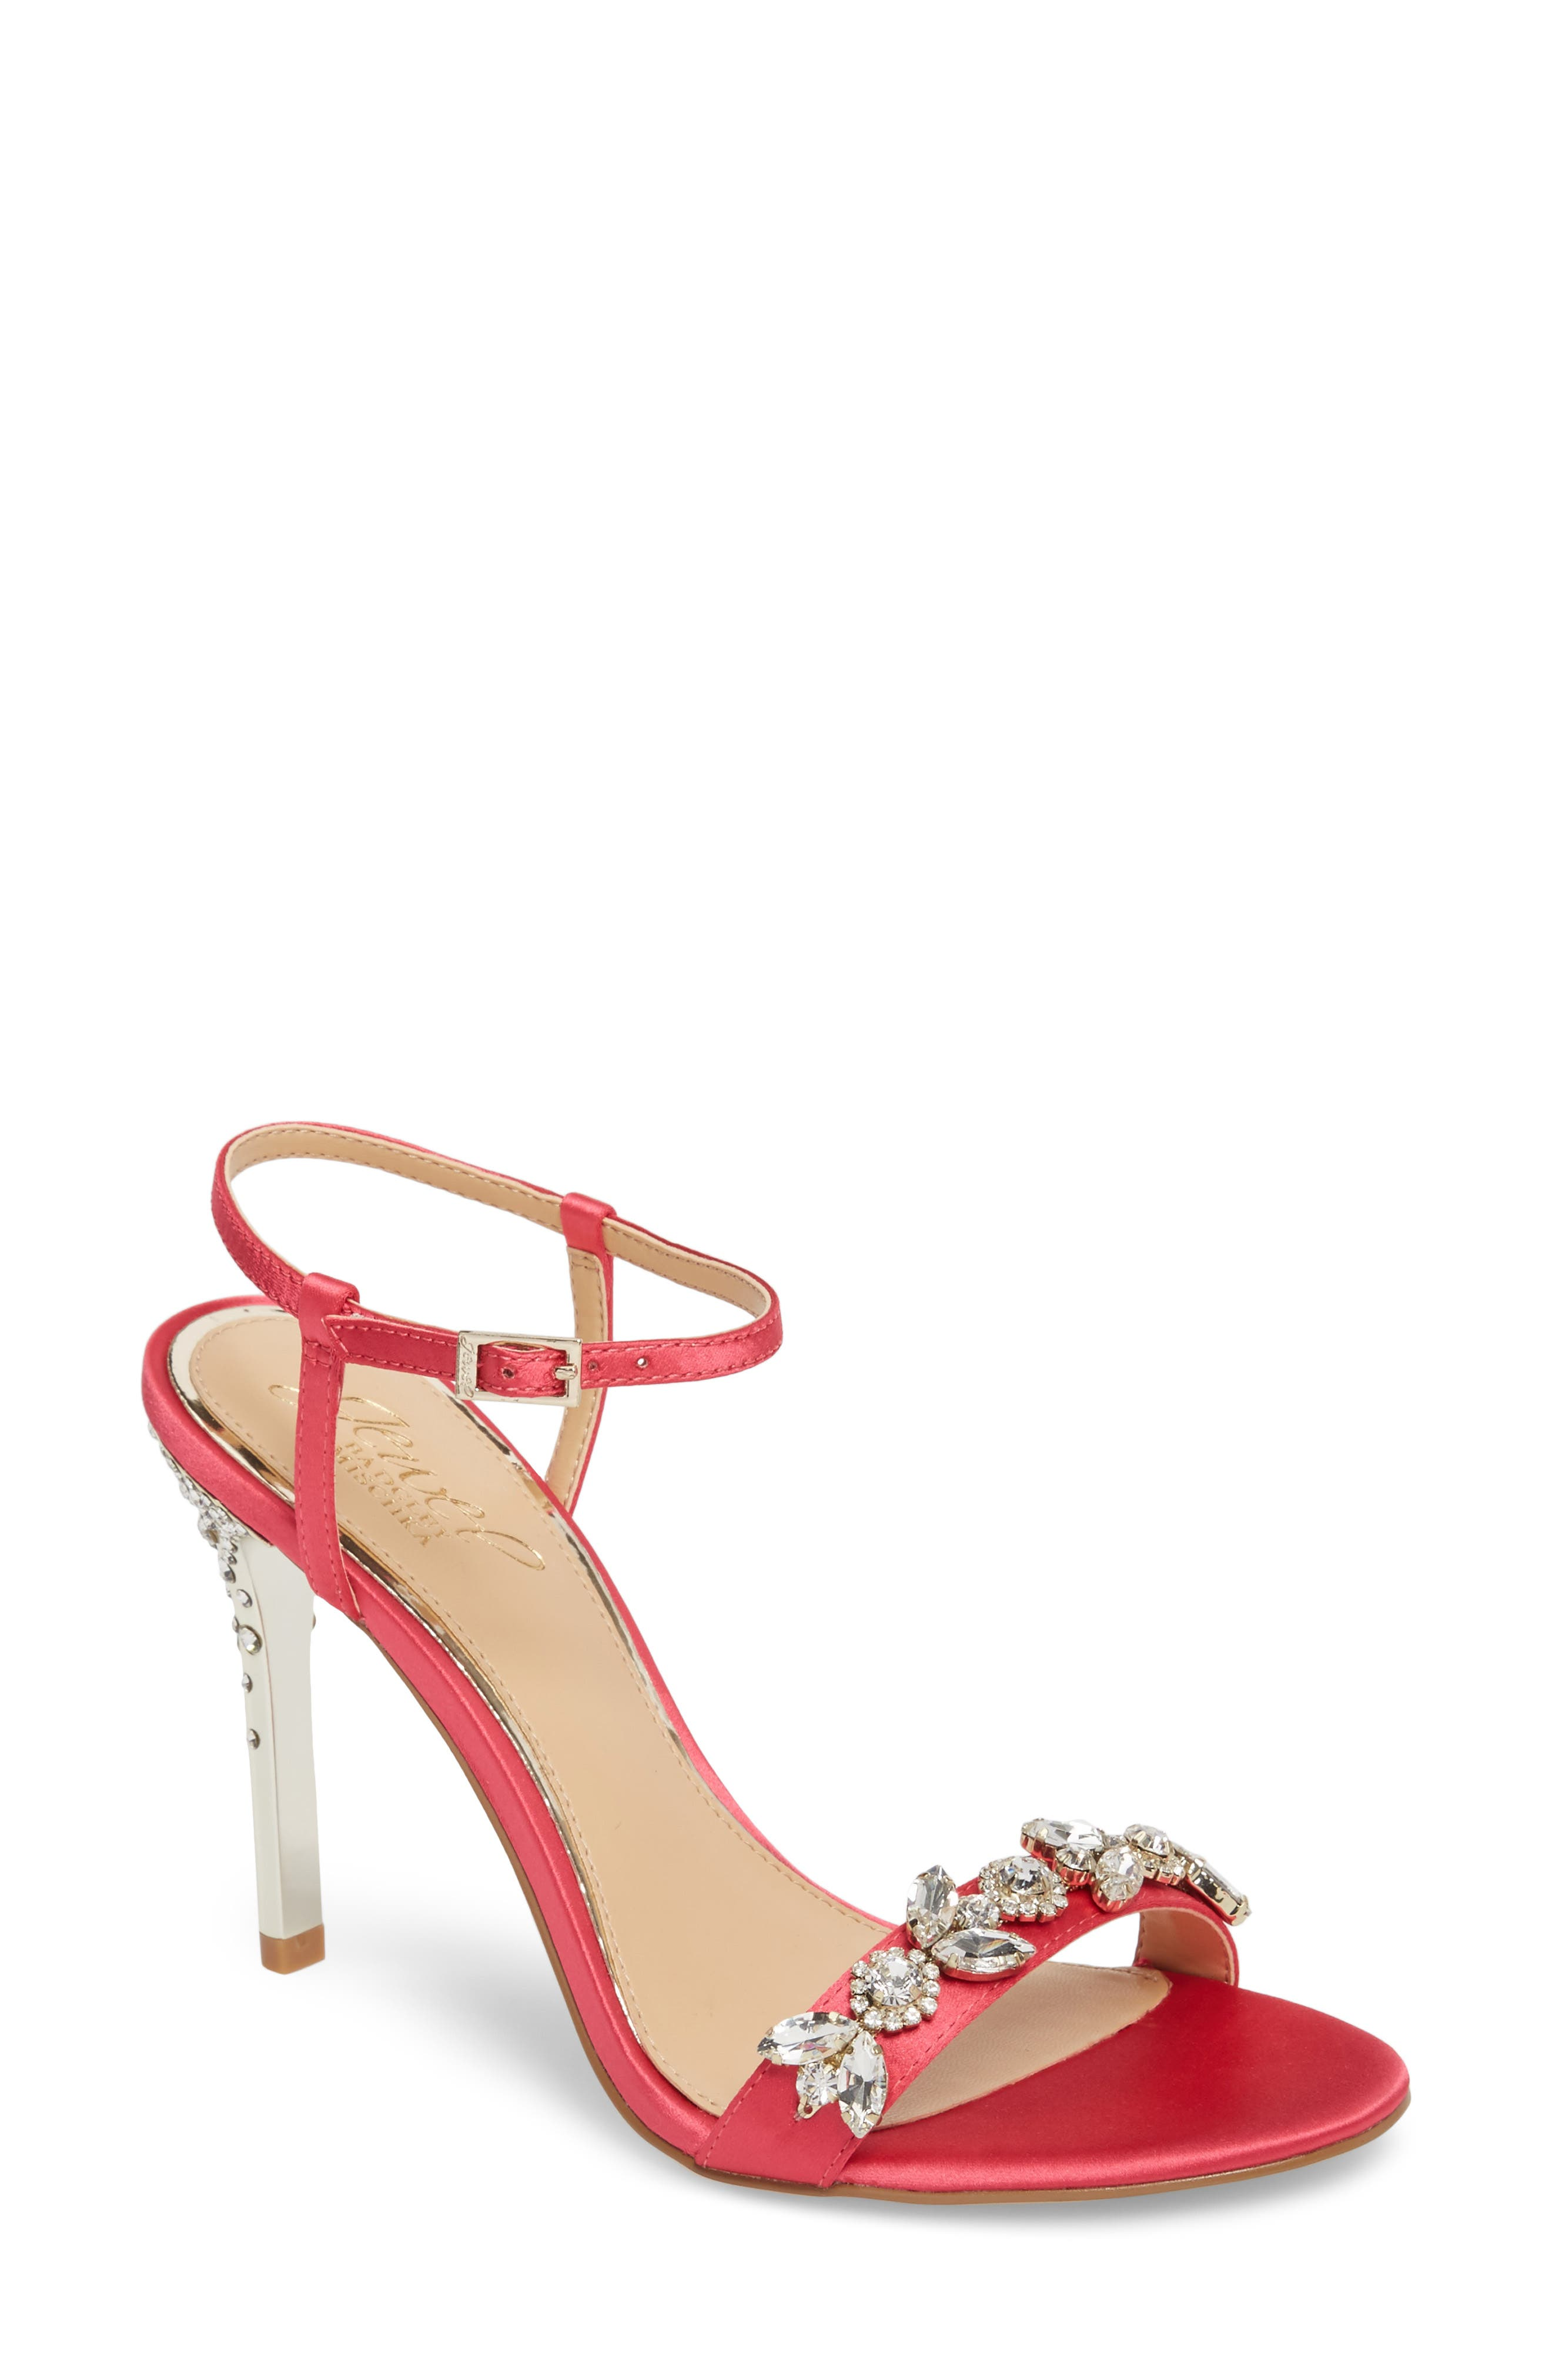 Alternate Image 1 Selected - Jewel Badgley Mischka Tex Ankle Strap Sandal (Women)